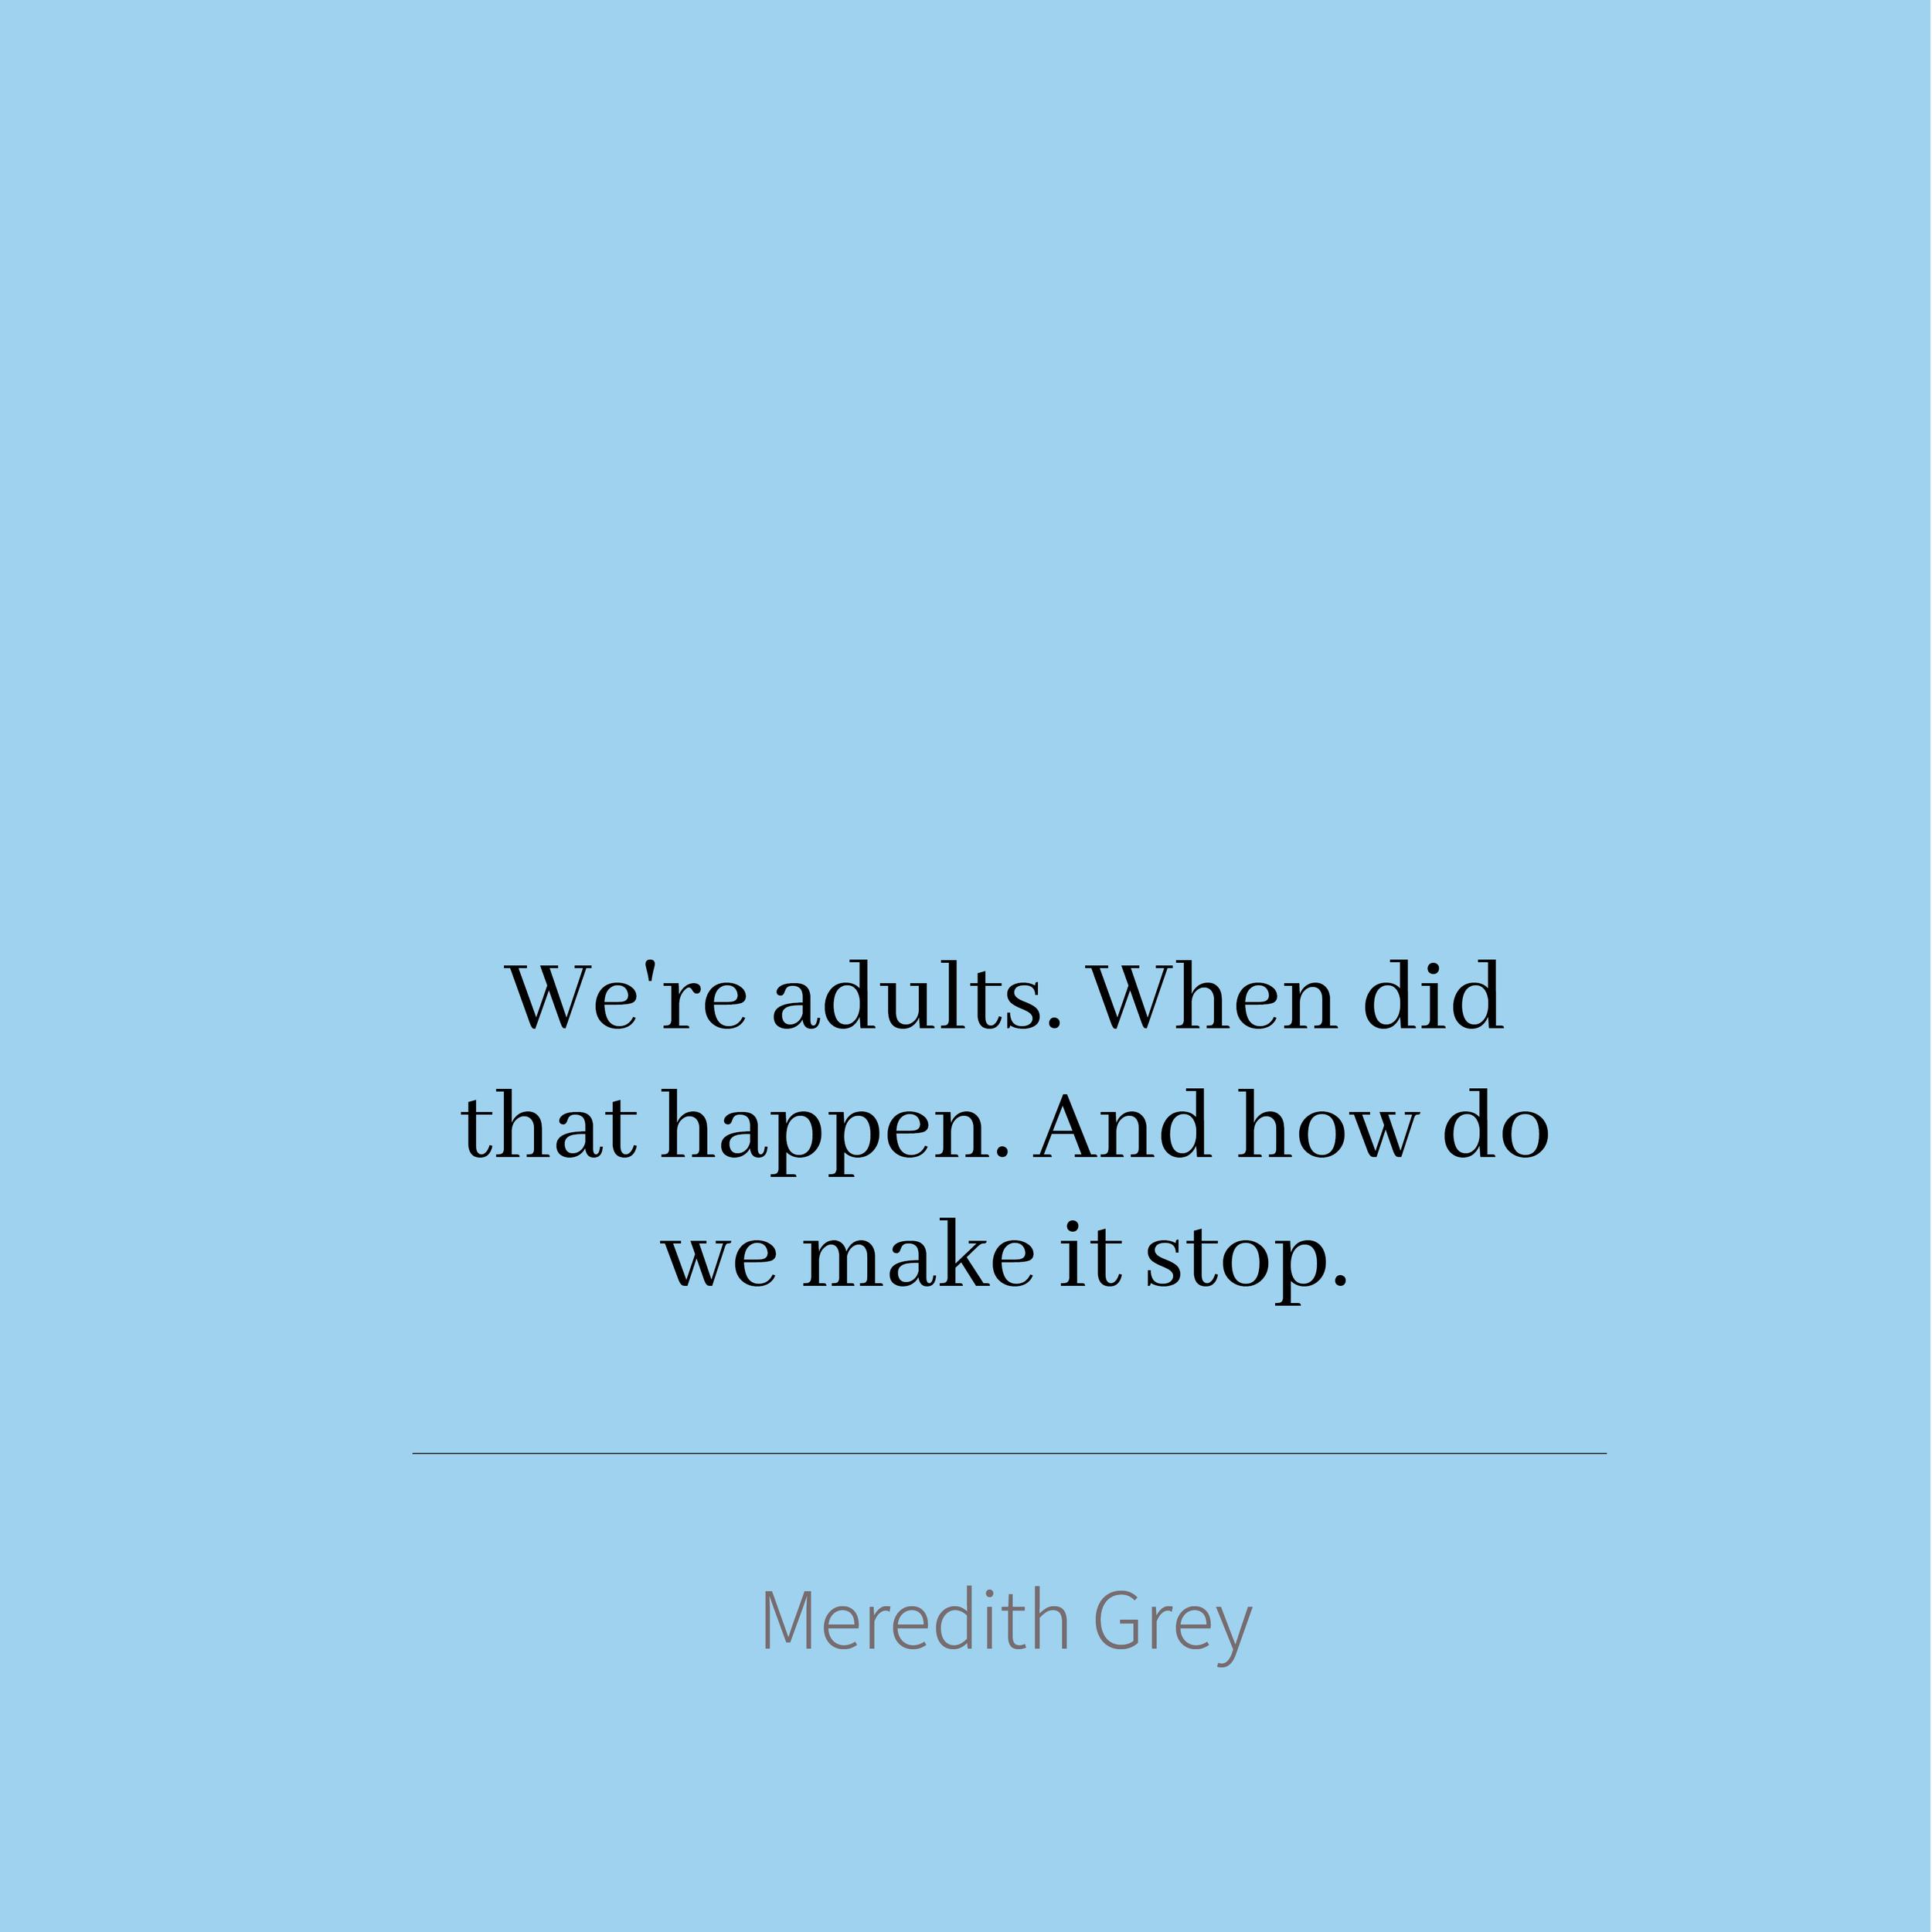 2019.05.31 Meredith Grey.png